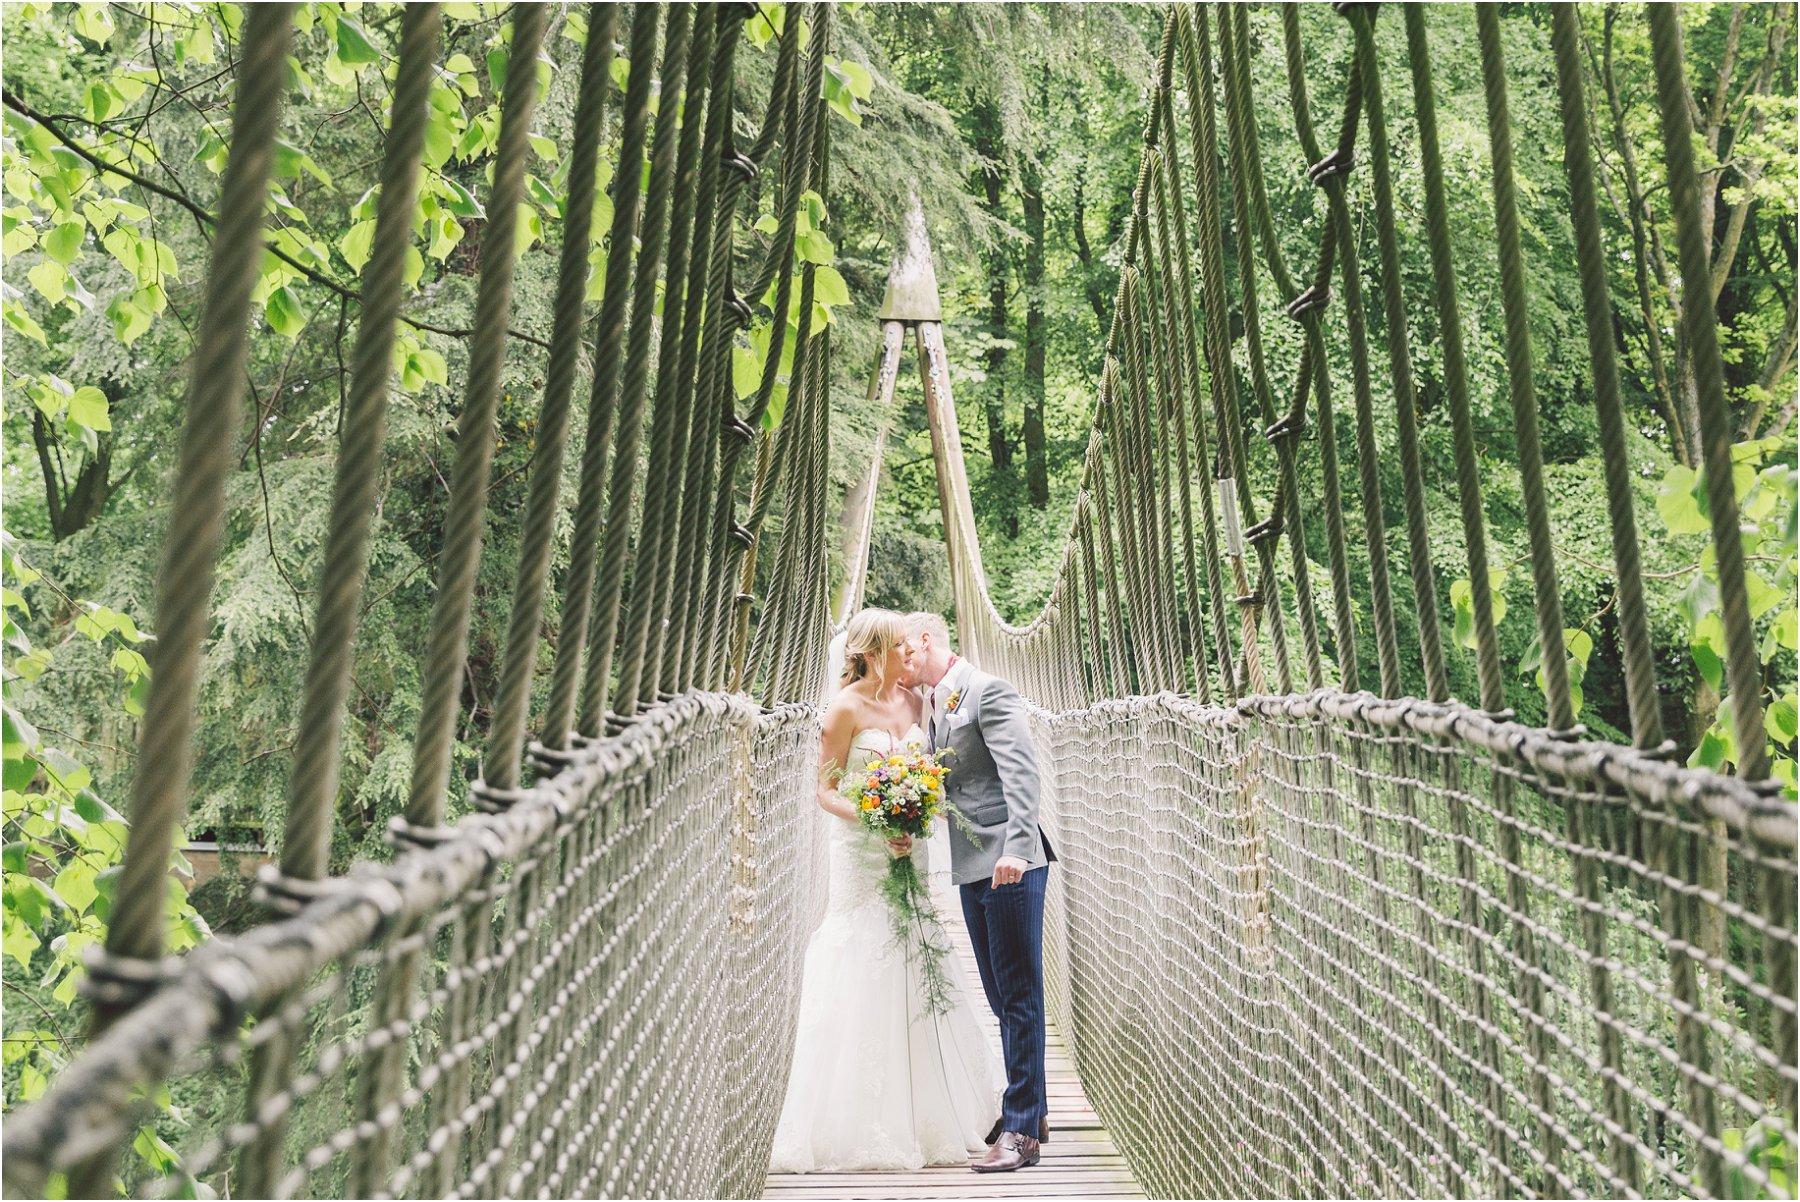 eve.photography.relaxed.creative.wedding.destination._0282.jpg